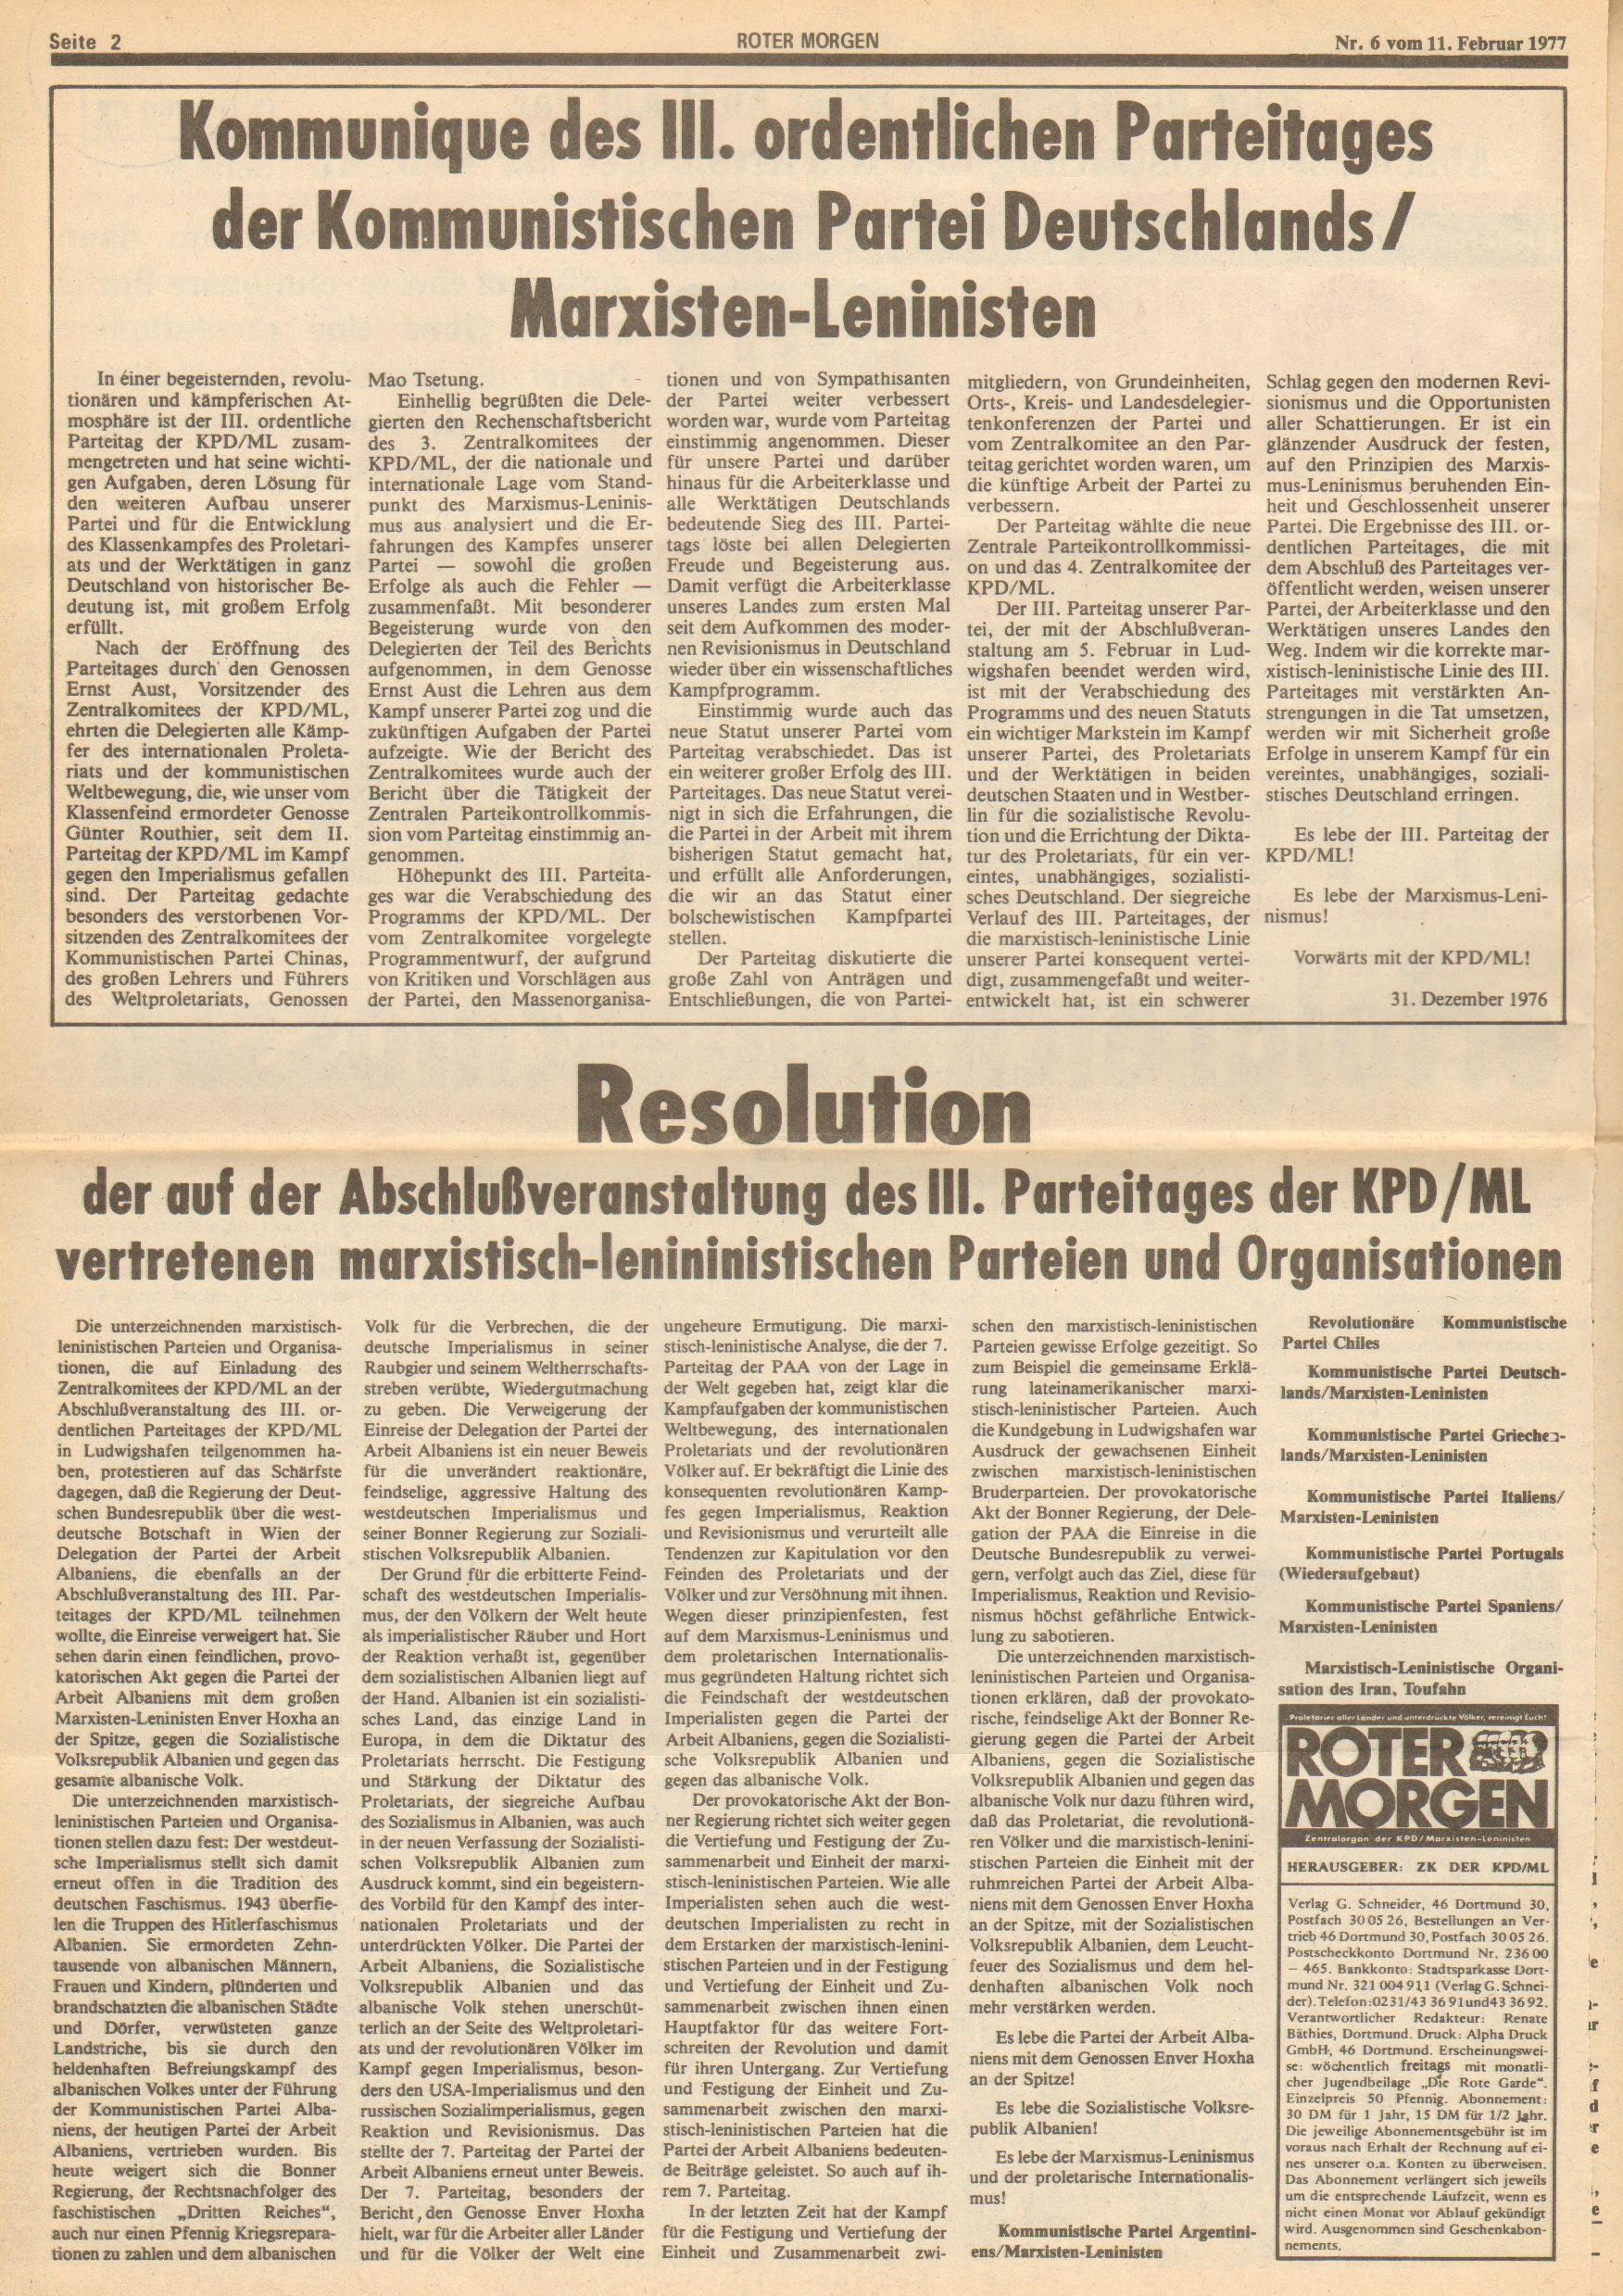 Roter Morgen, 11. Jg., 11. Februar 1977, Nr. 6, Seite 2